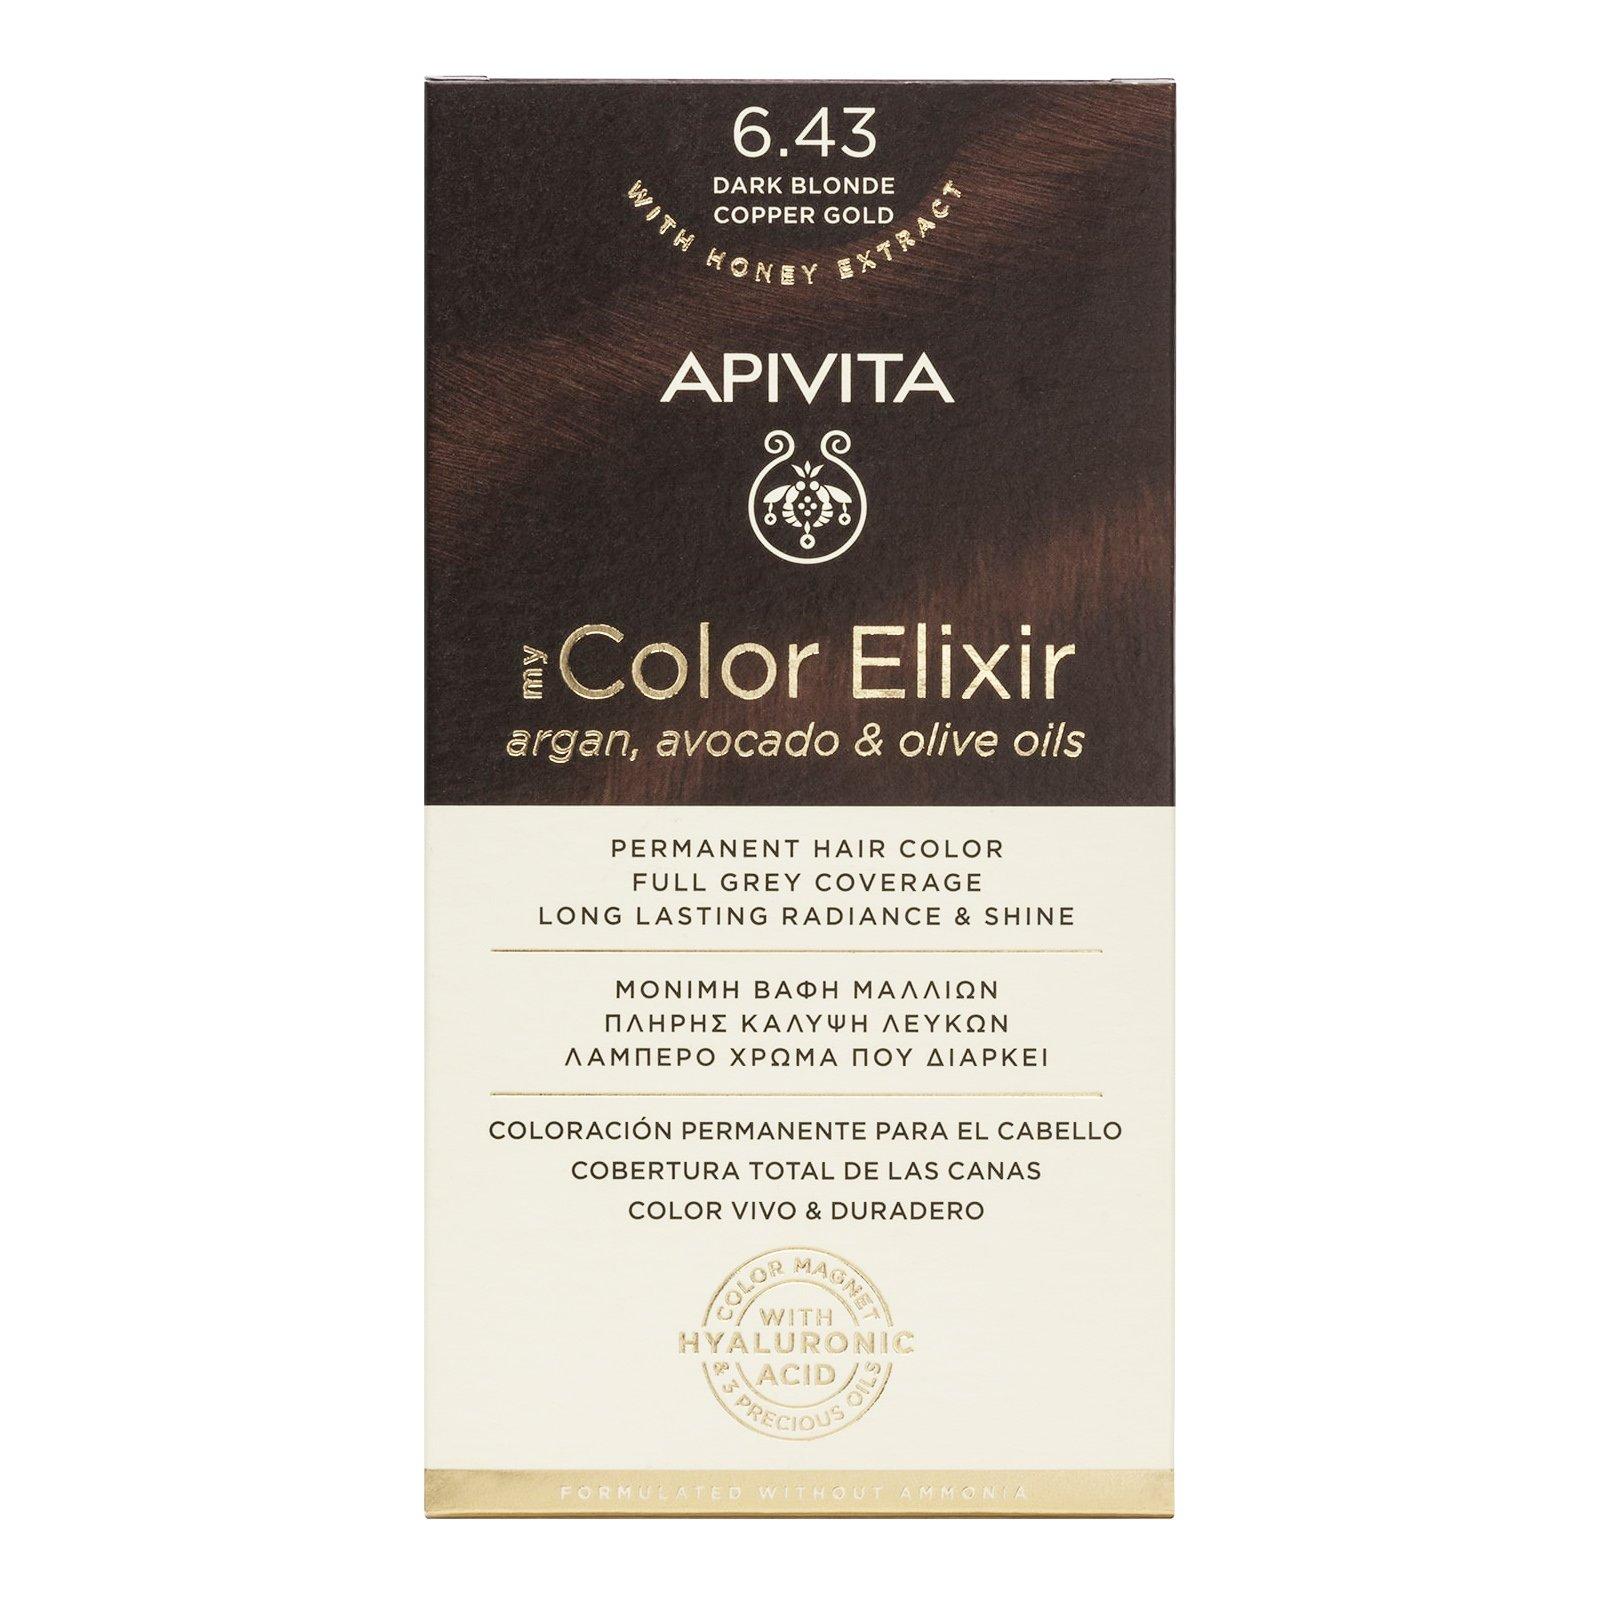 Apivita My Color Elixir Μόνιμη Βαφή Μαλλιών με Καινοτόμο Σύστημα Color Magnet που Σταθεροποιεί και Σφραγίζει το Χρώμα στην Τρίχα – N 6.43 ΞΑΝΘΟ ΣΚΟΥΡΟ ΧΑΛΚΙΝΟ ΜΕΛΙ